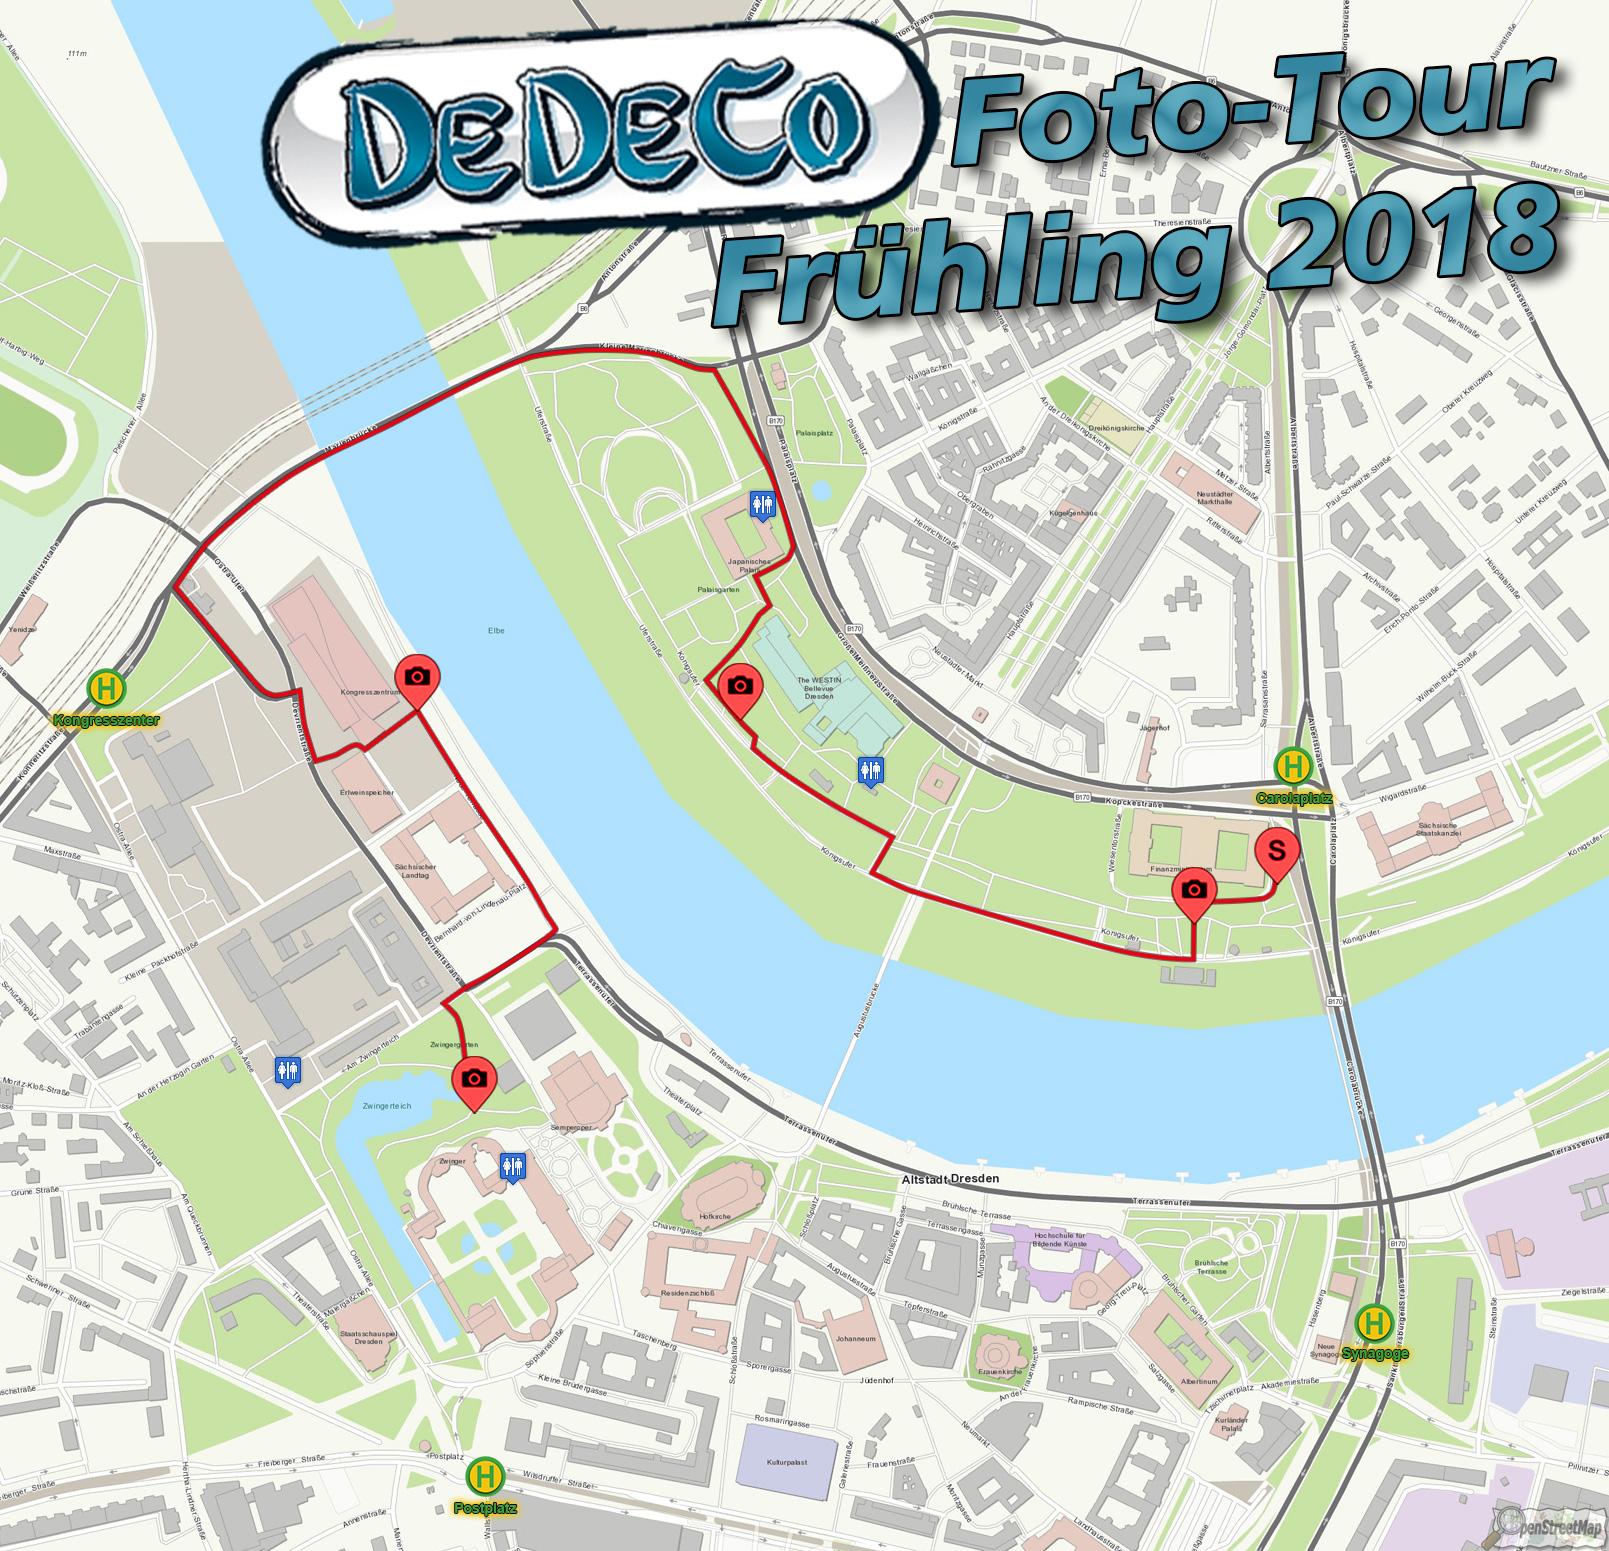 DeDeCo Fotot Tur Vol 12 Streckenplan